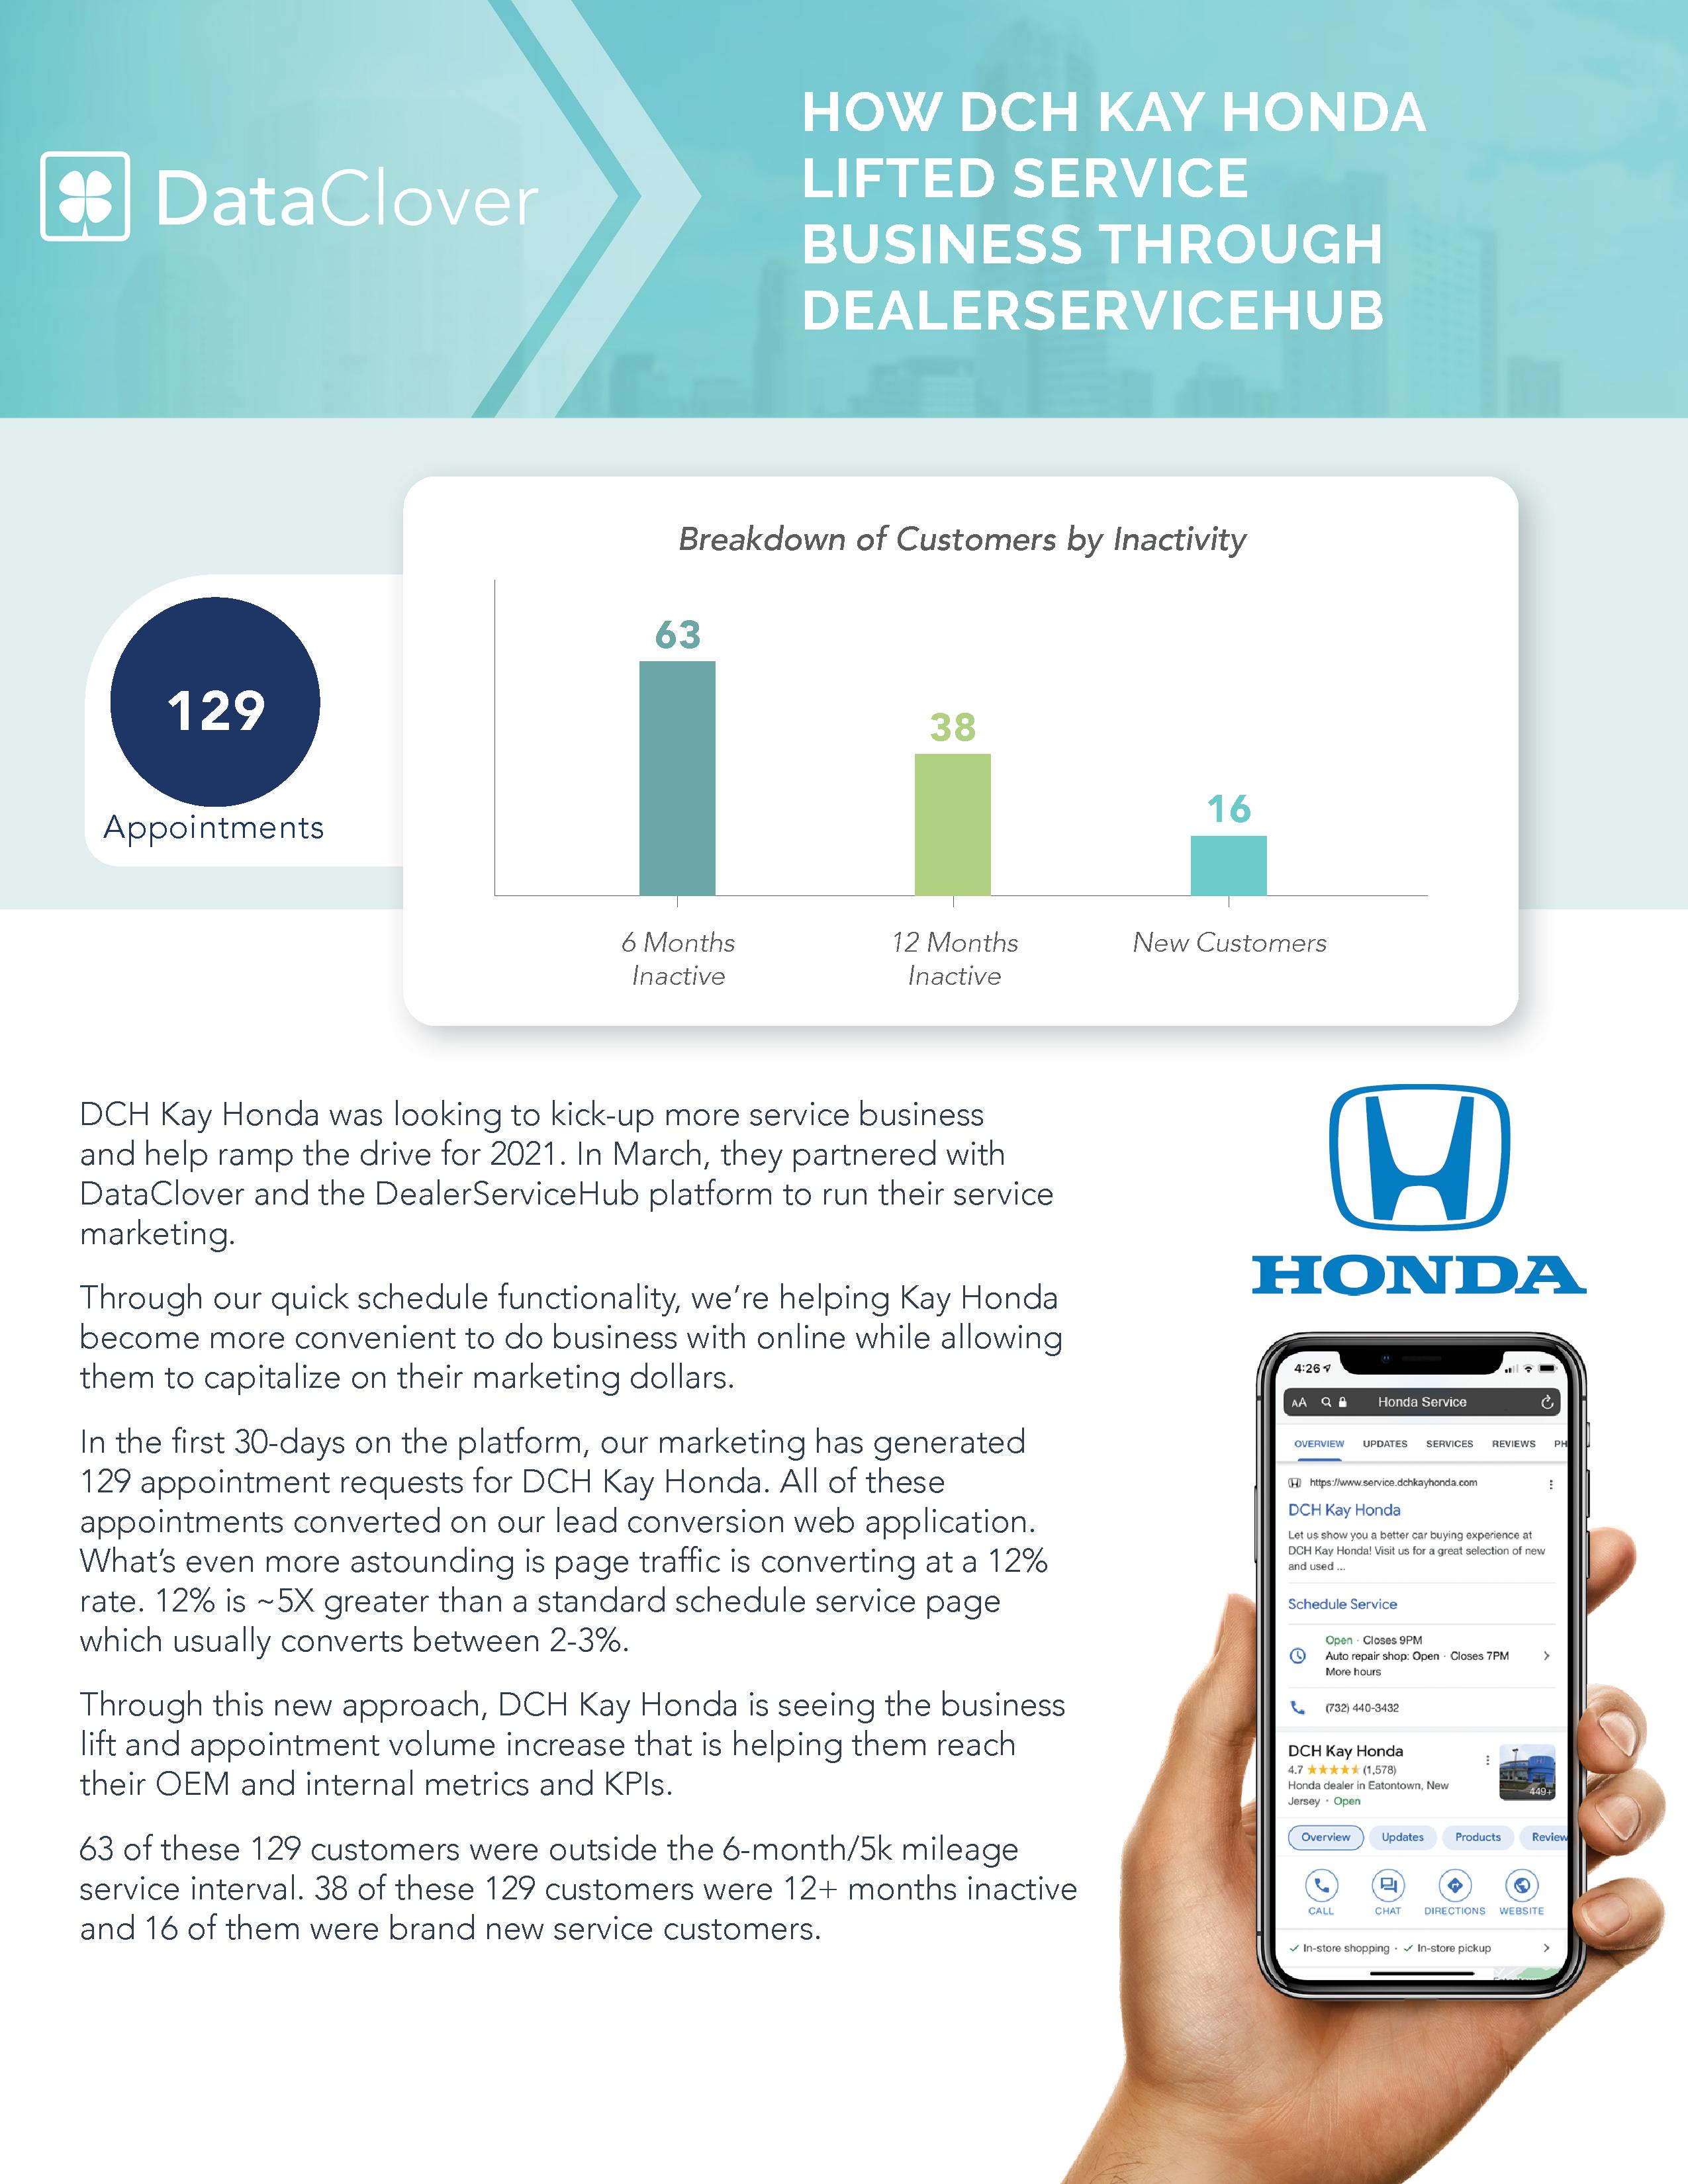 dch kay honda pdf coverpage